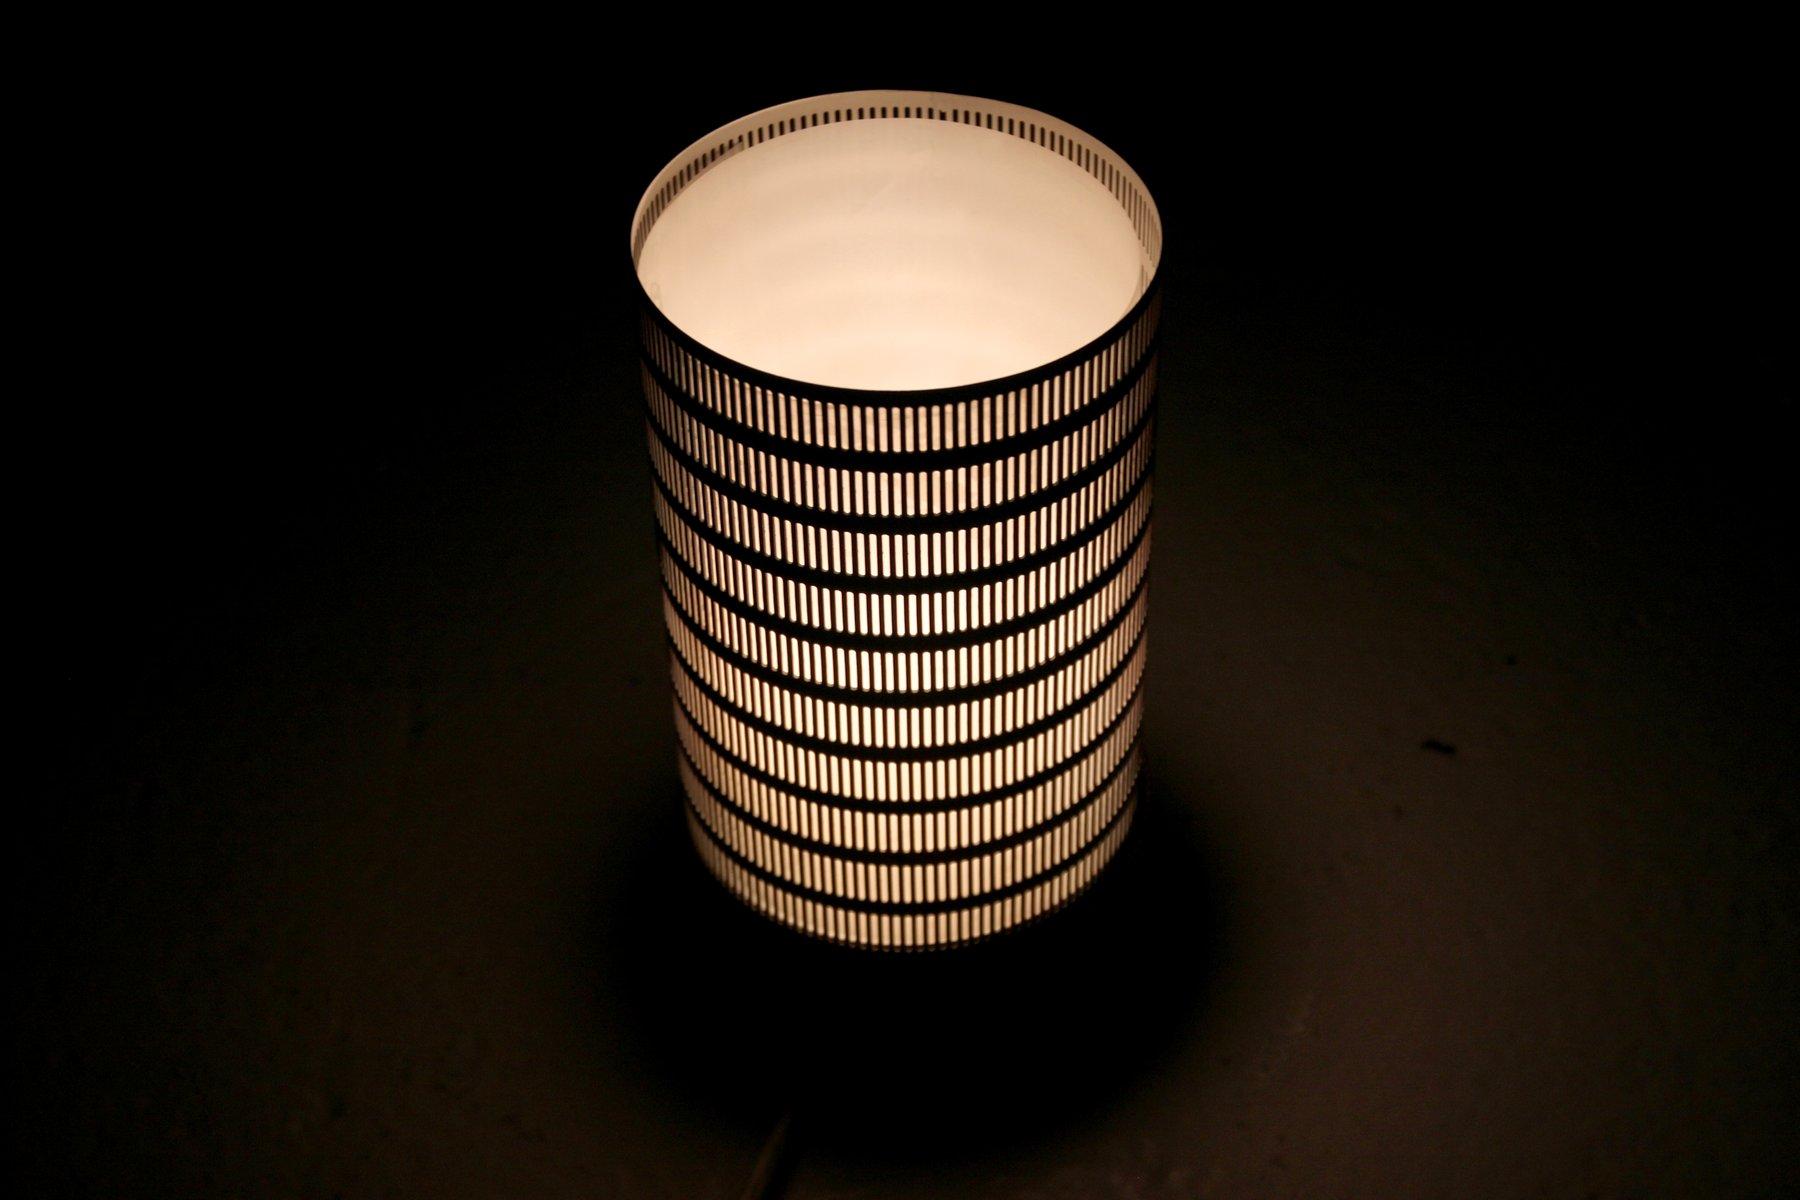 lampe de bureau scandinave mid century de falkenbergs belysning 1970s en vente sur pamono. Black Bedroom Furniture Sets. Home Design Ideas